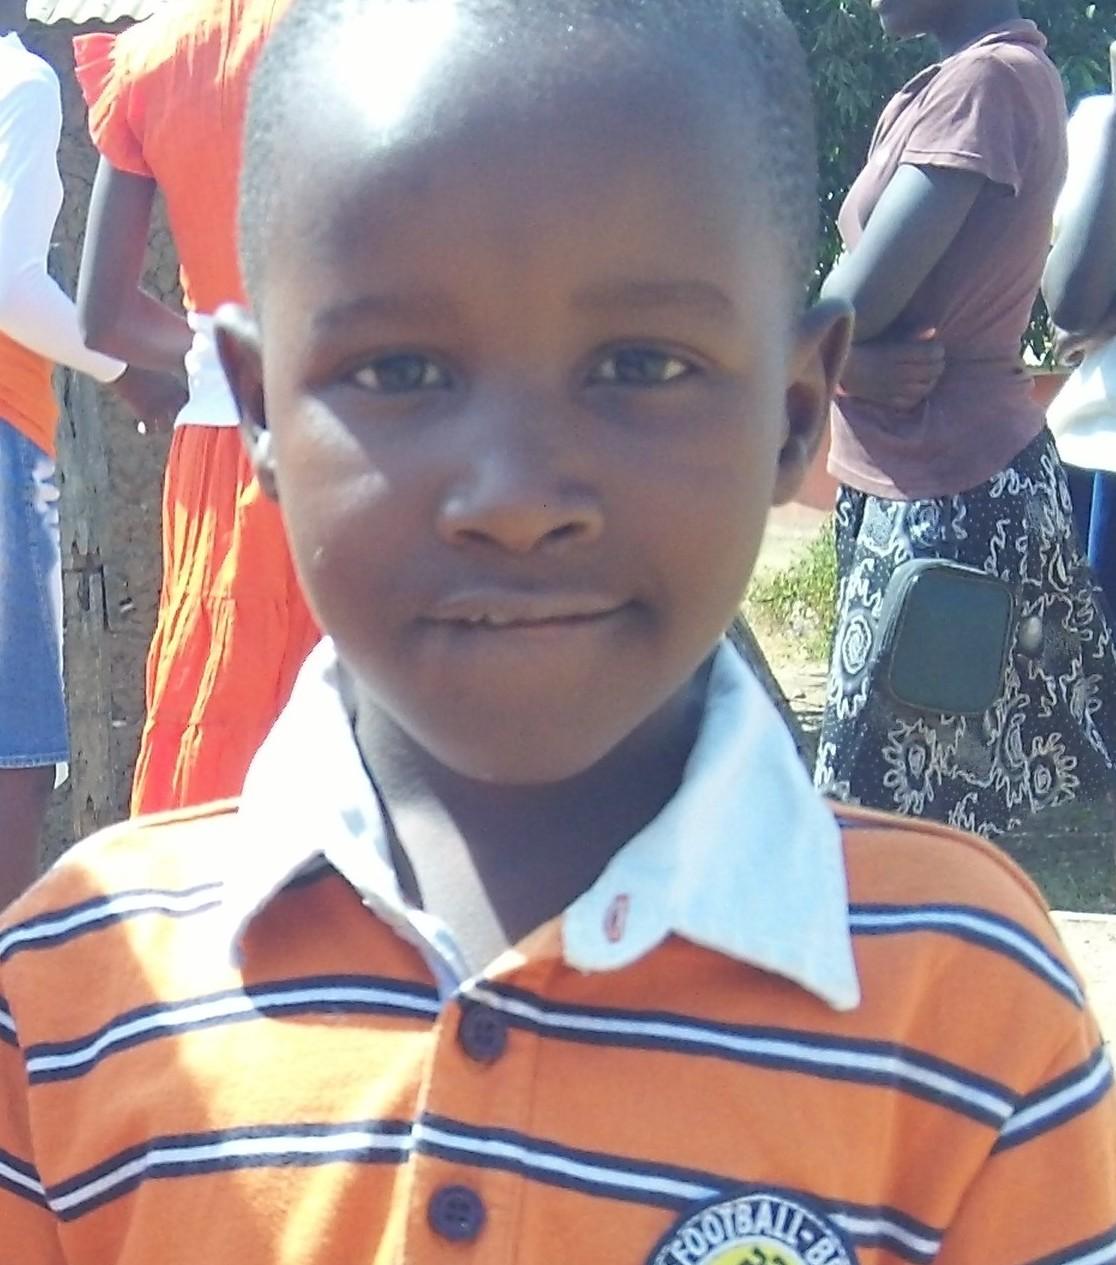 Little Milton in his orange shirt